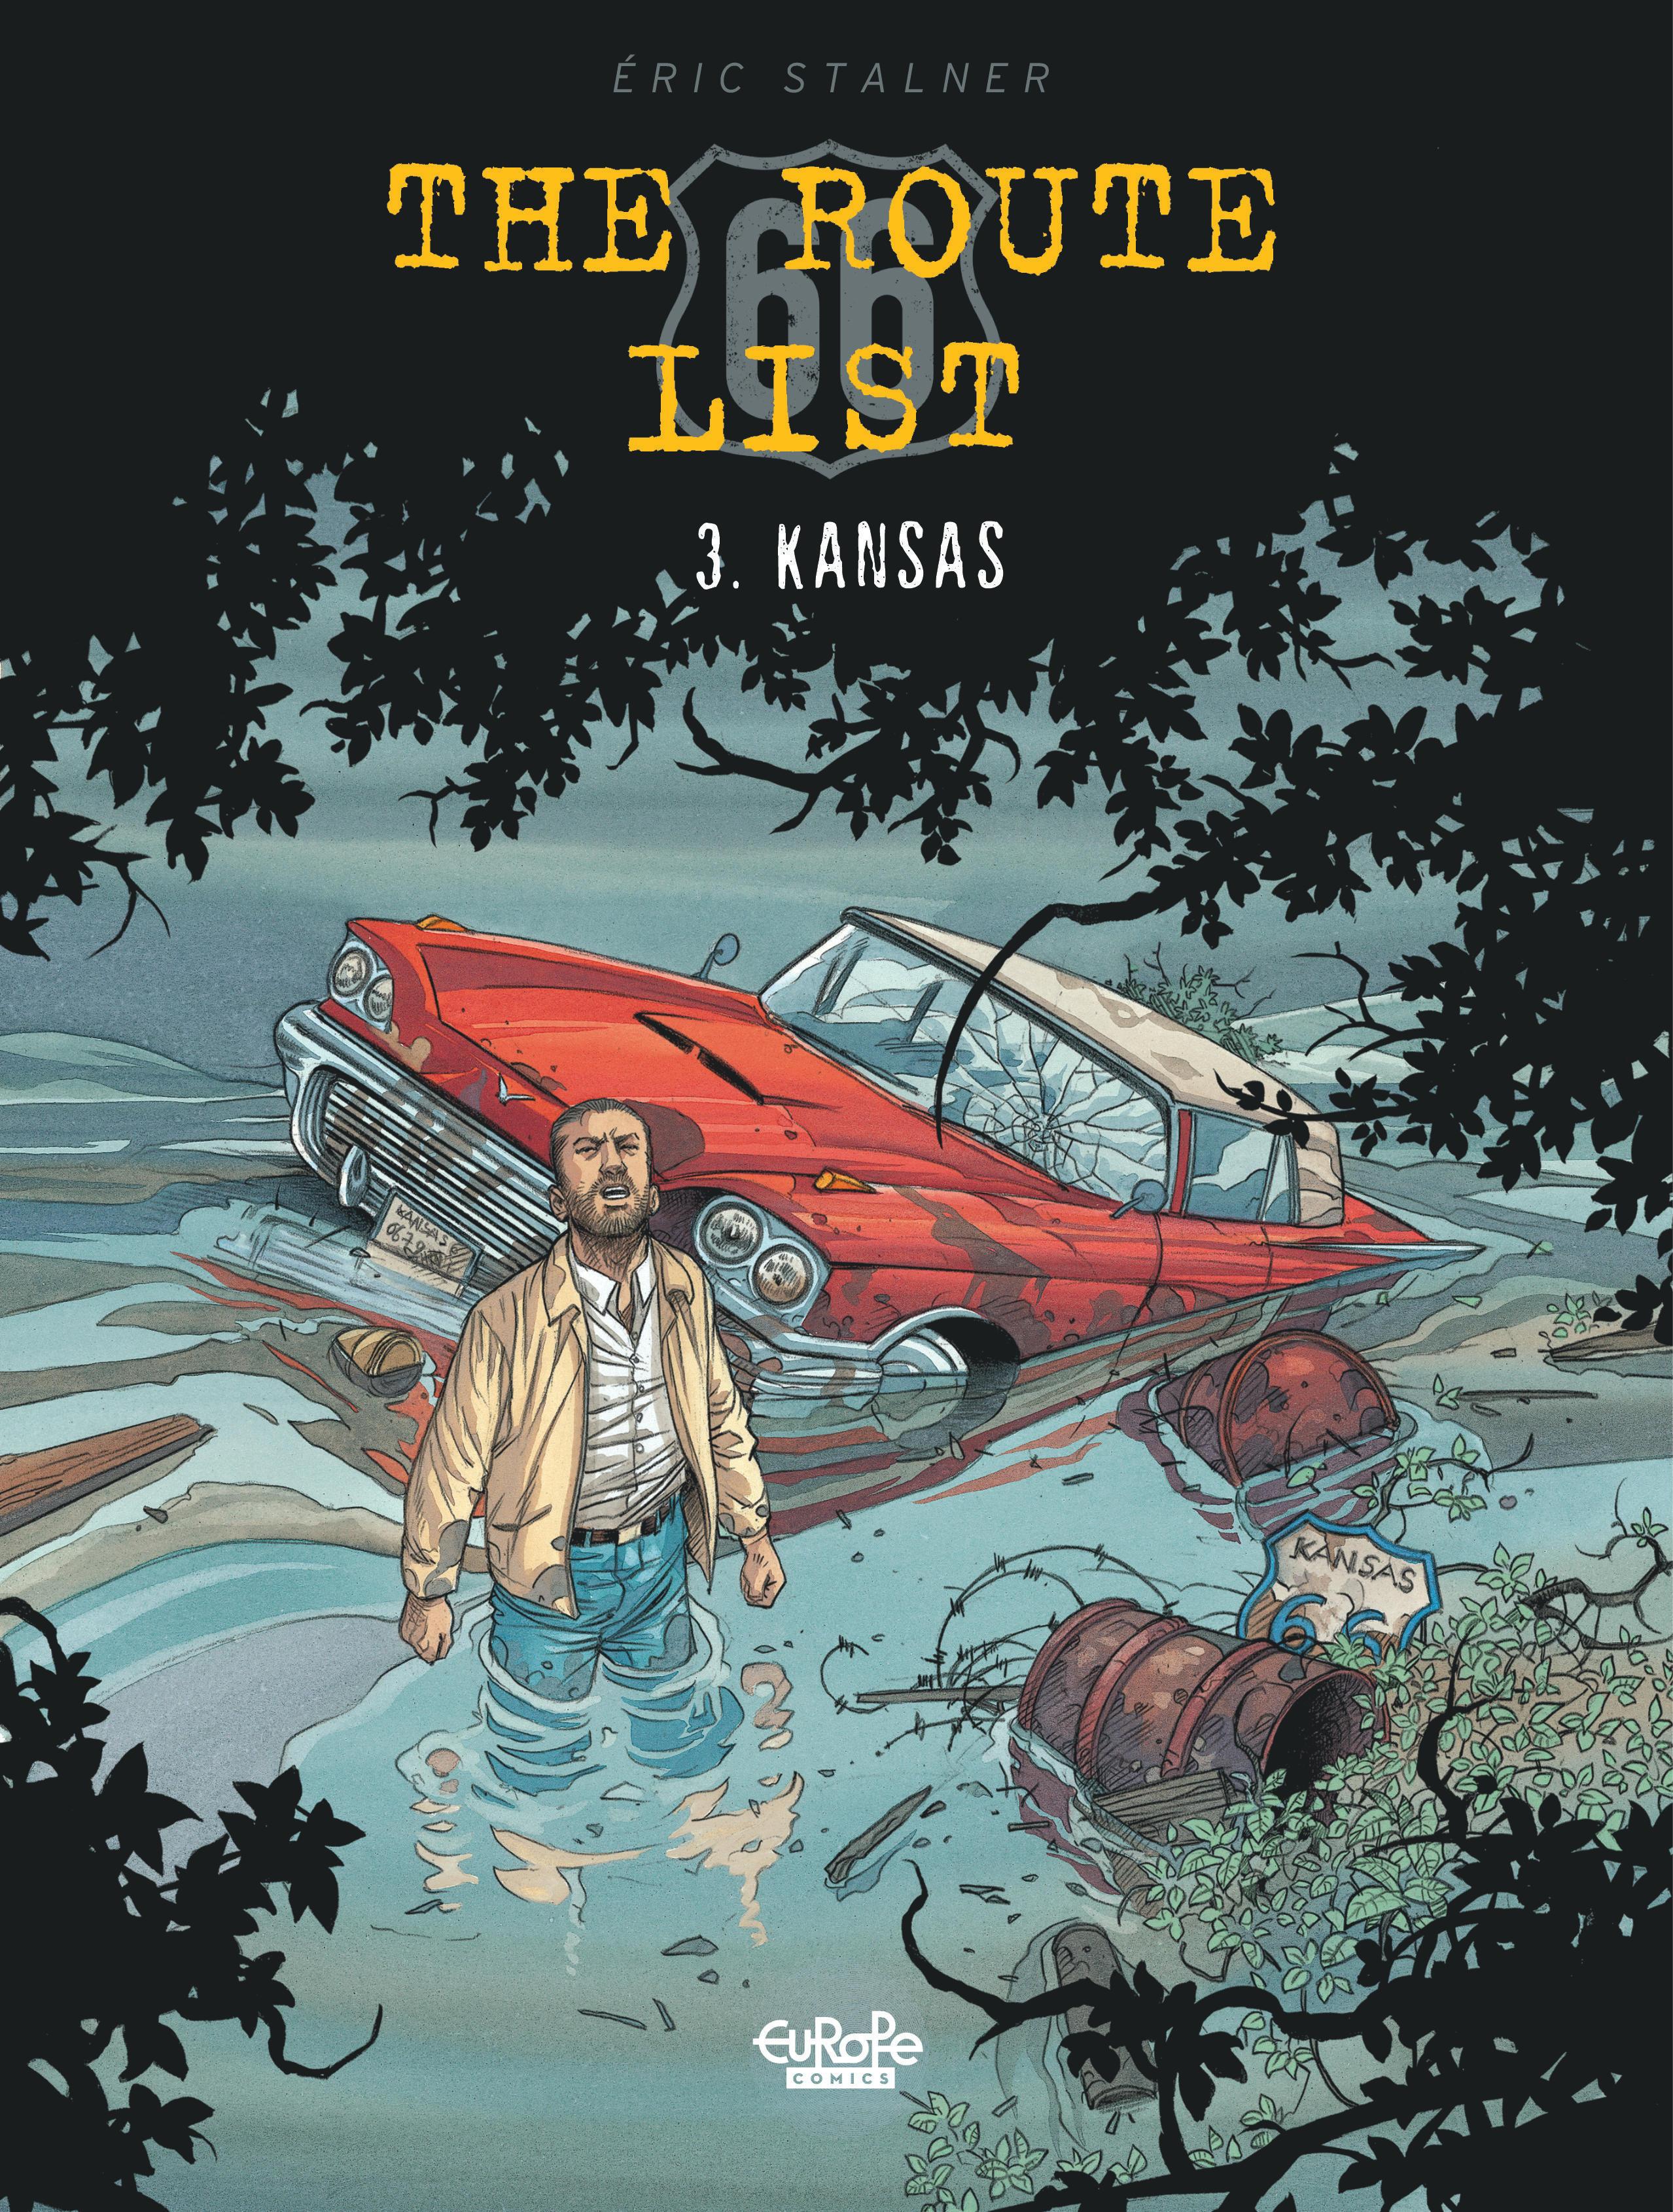 The Route 66 List 3. Kansas